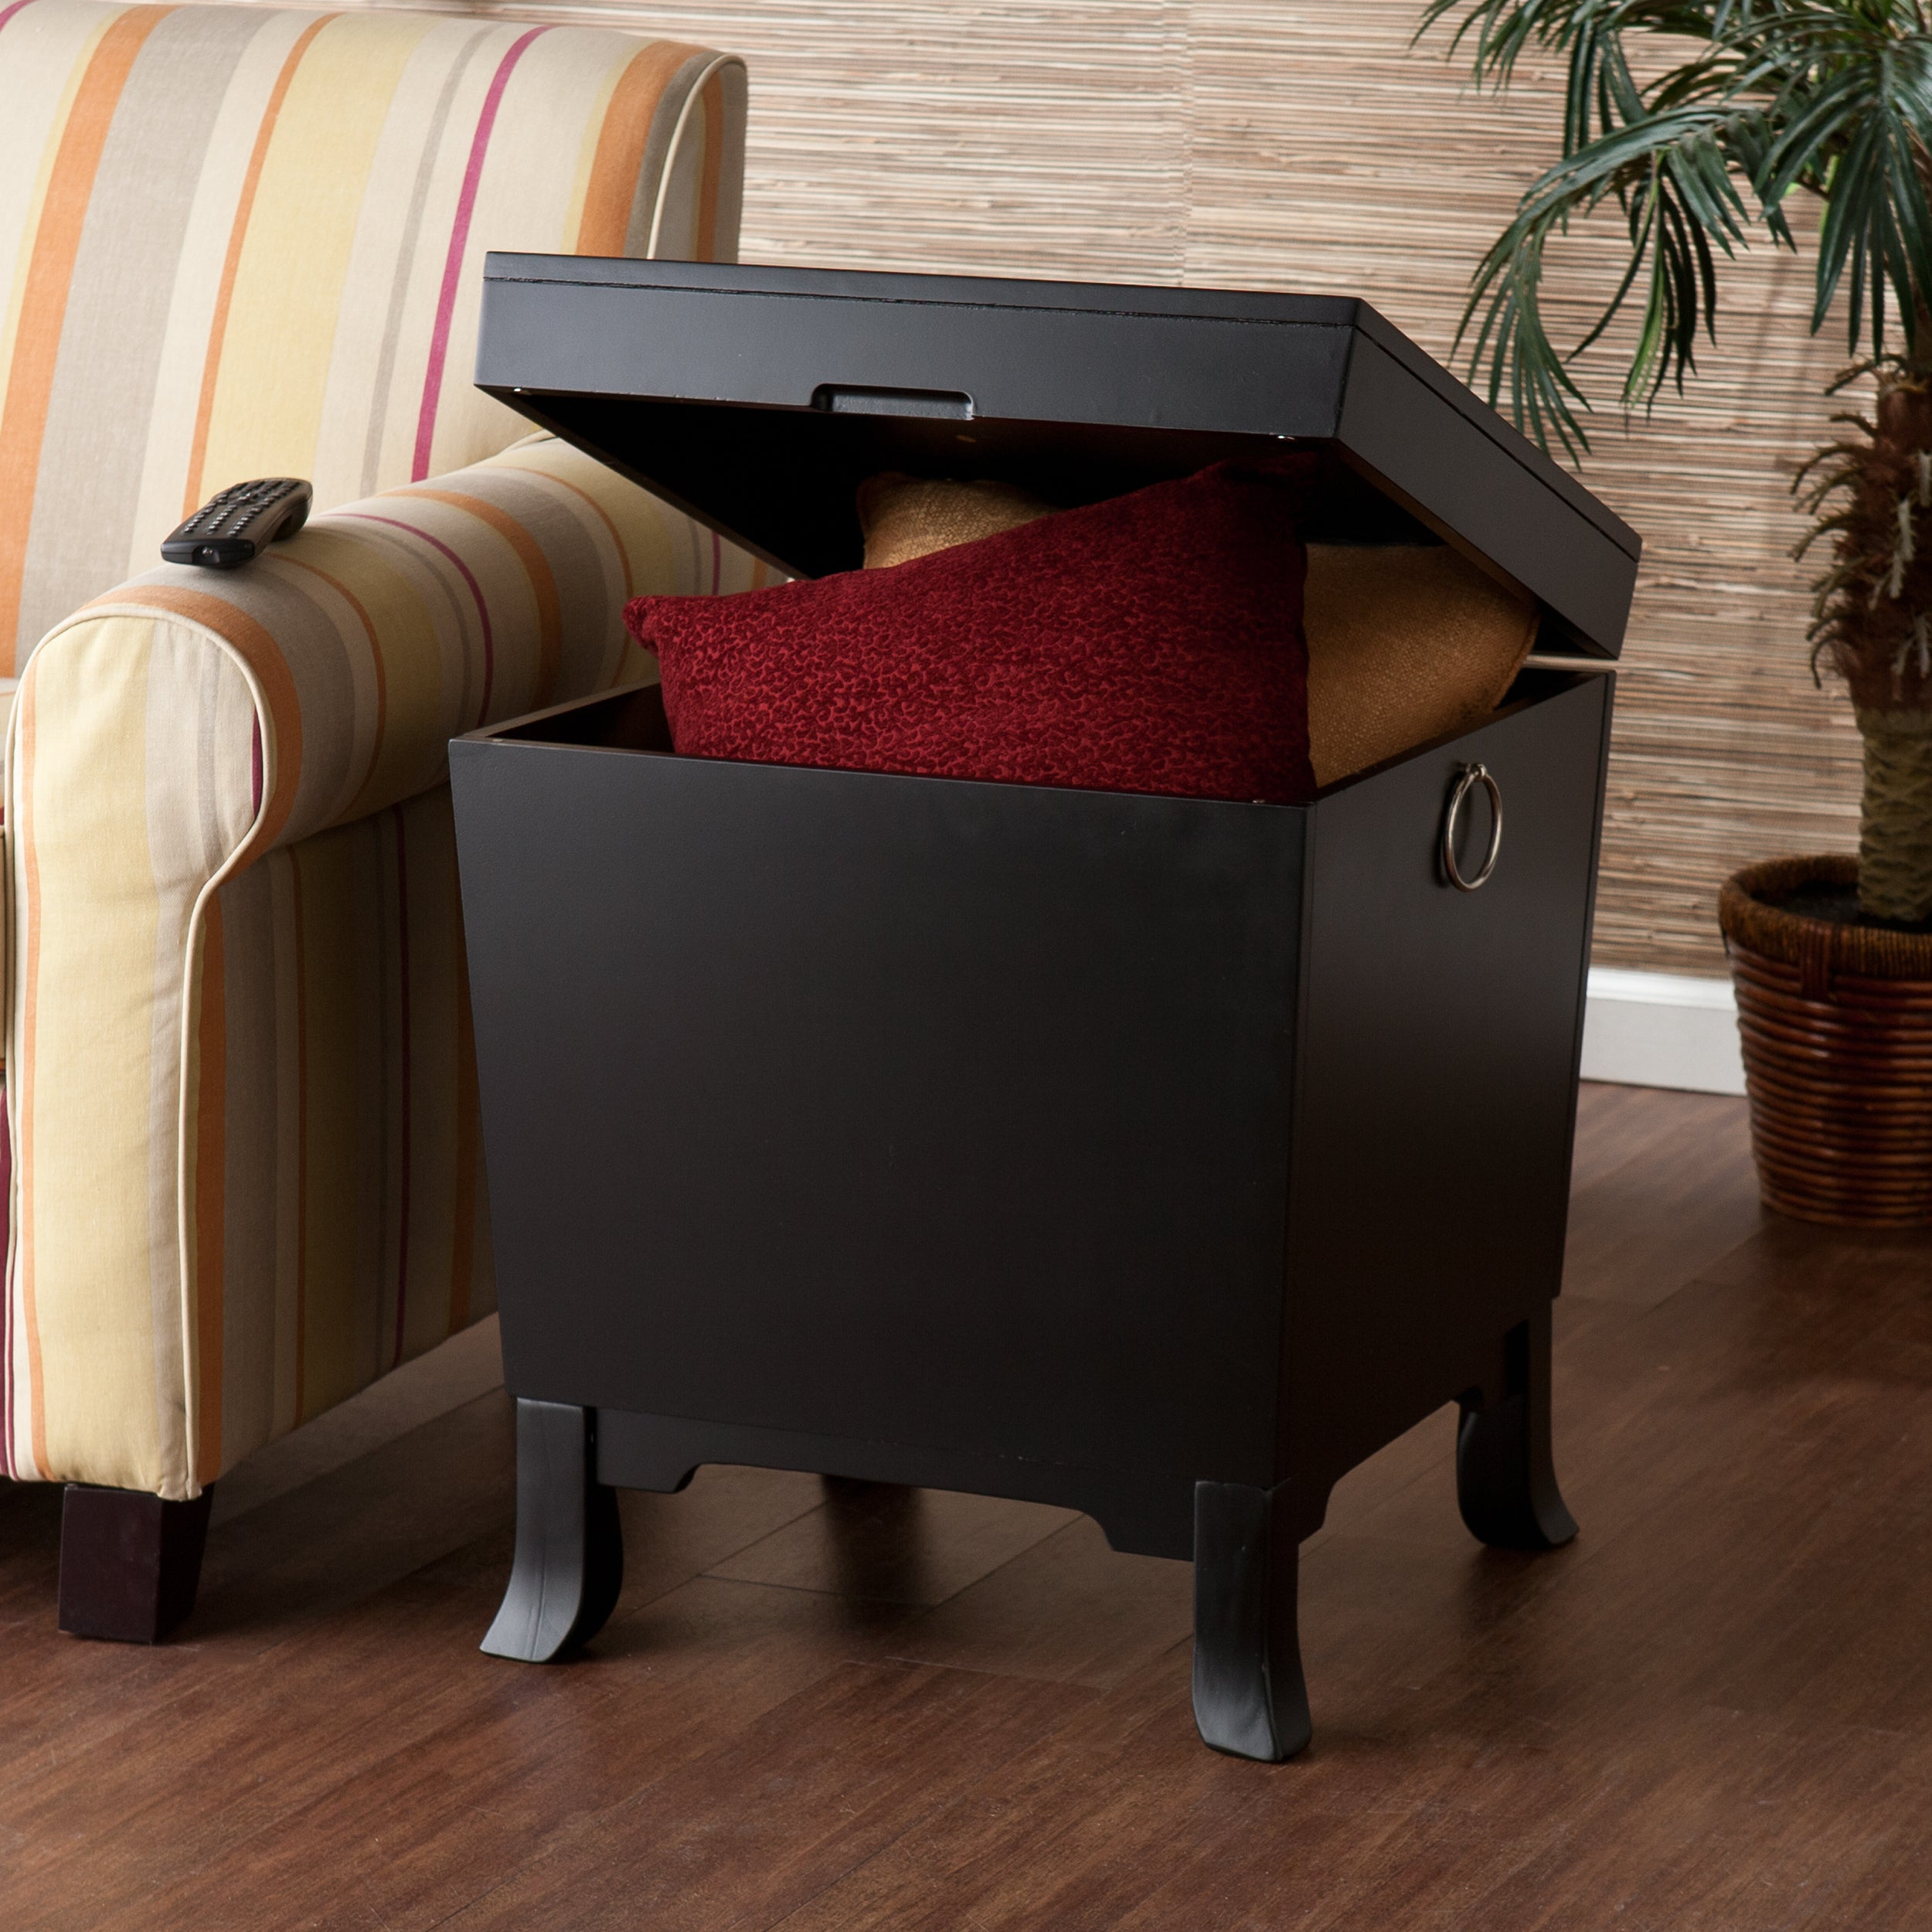 Harper Blvd Parsons Black End Table Trunk (OS5223)